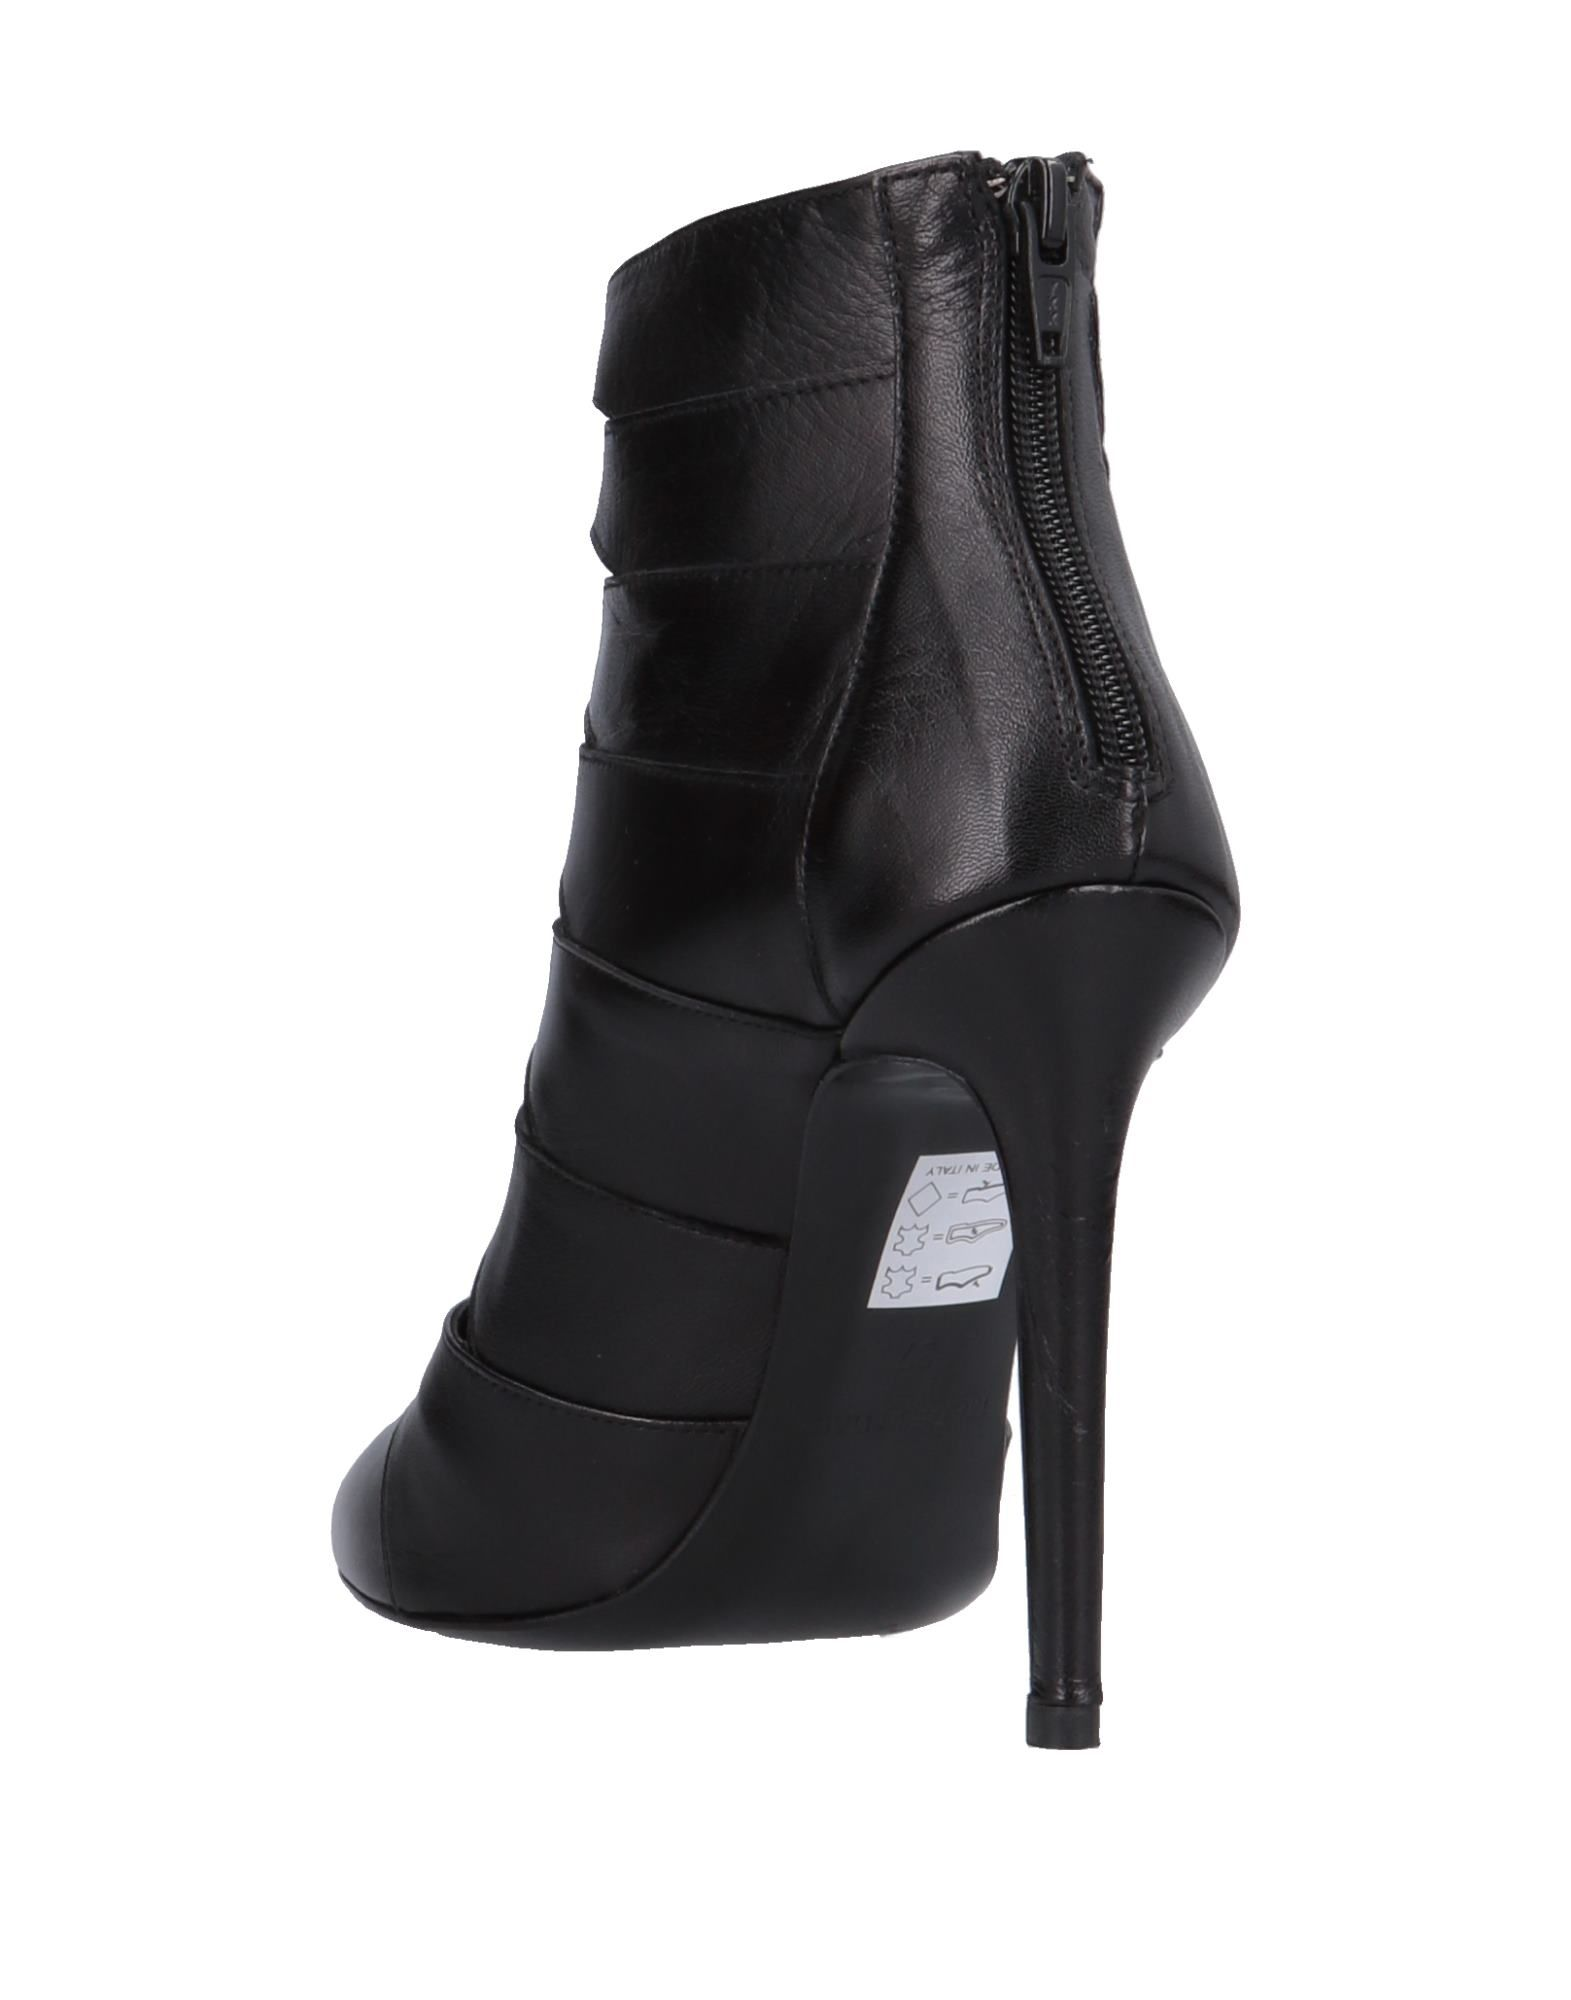 Unlace Gute Stiefelette Damen  11549272PD Gute Unlace Qualität beliebte Schuhe 30849b